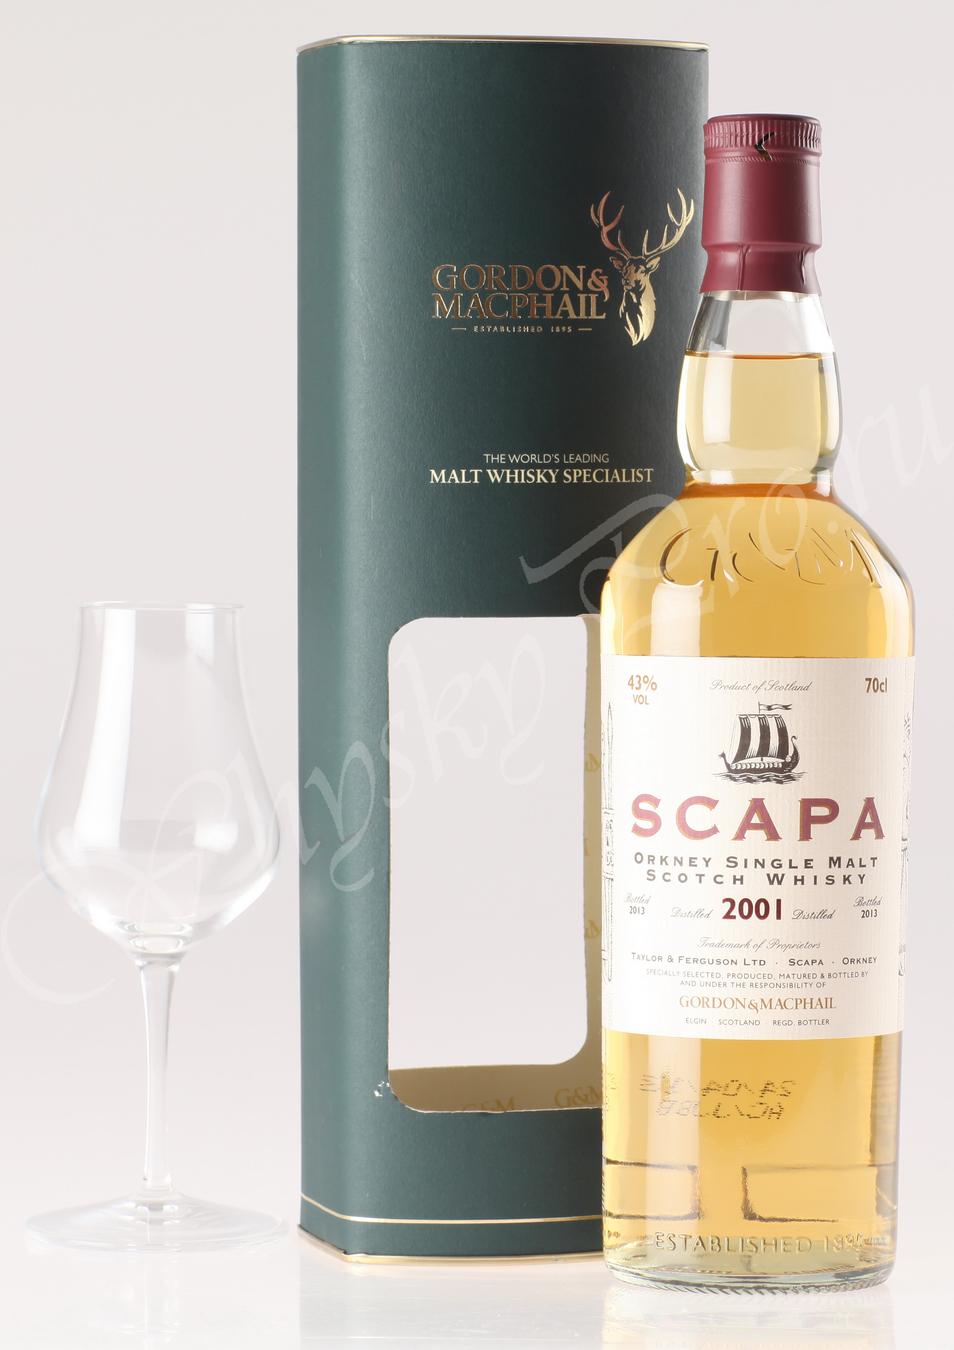 Виски Шотландский виски Скапа 2001 года виски Scapa 2001 year Gordon & Macphail